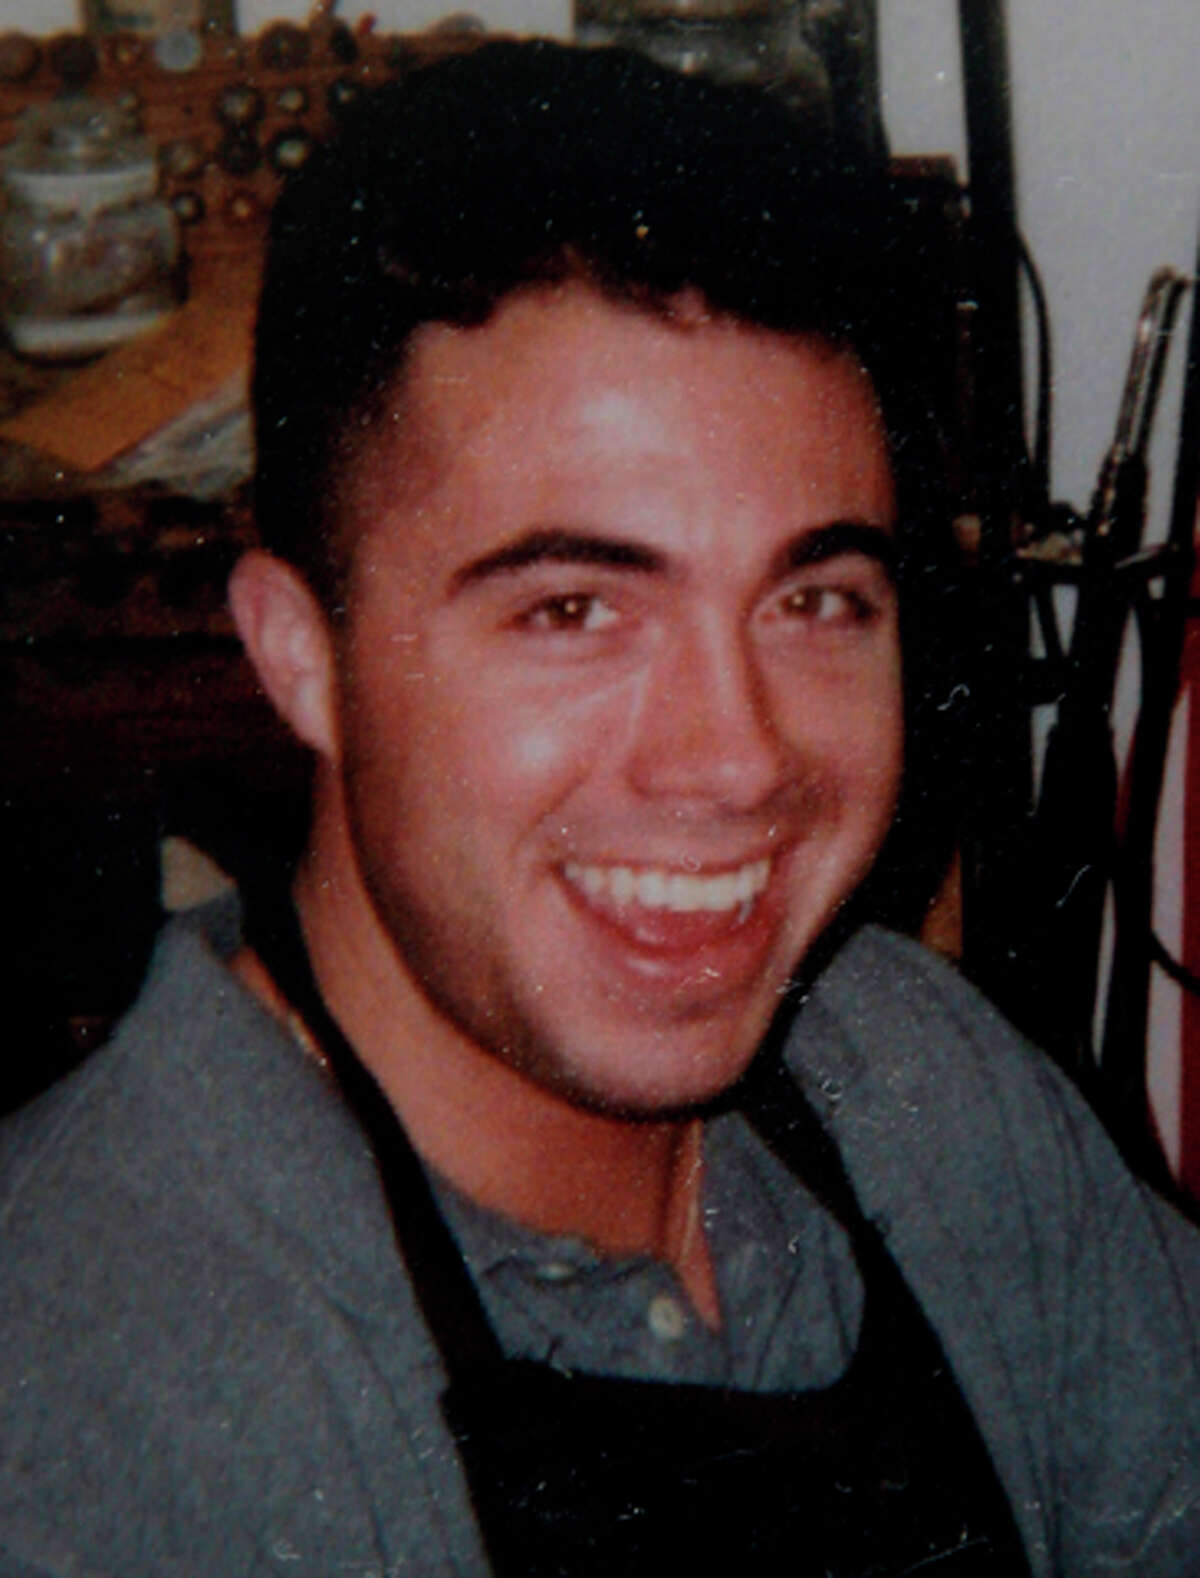 Aaron Goodman, 31, died in 2006. Family photo